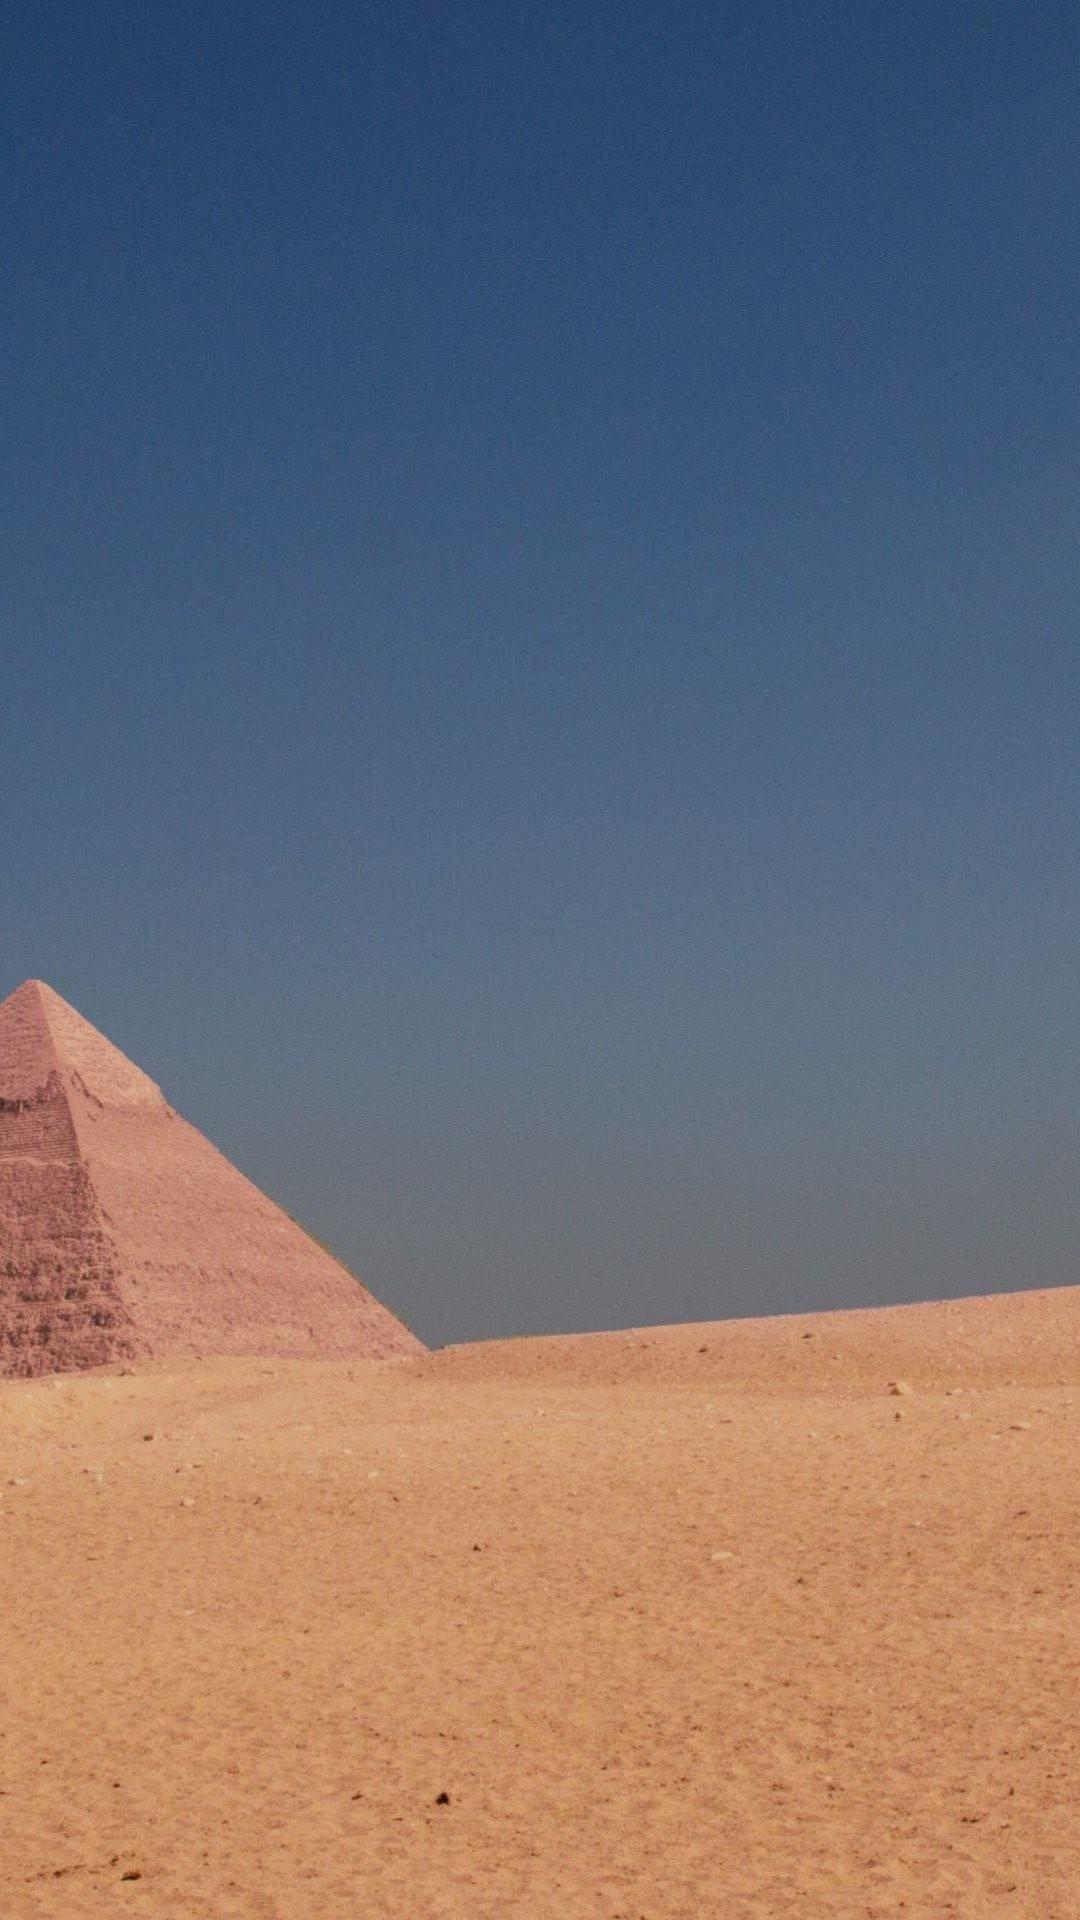 Egipt Pyramid Blue Sky iPhone 6 Plus HD Wallpaper …